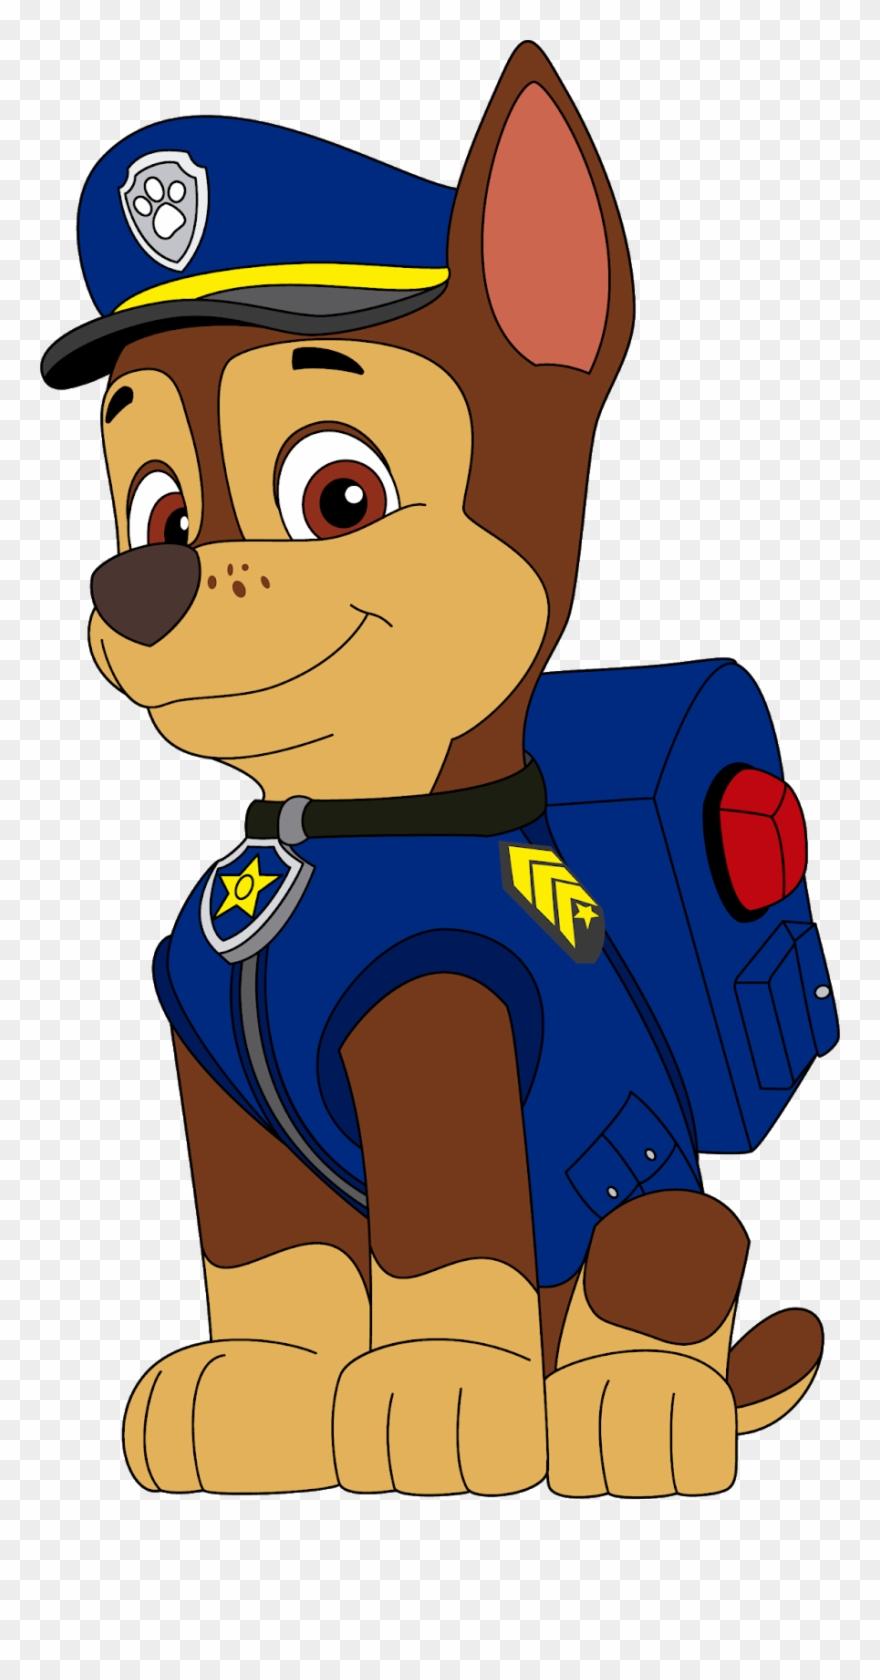 Patrulha Canina Vetor Grátis Paw Patrol Free Vector Clipart.